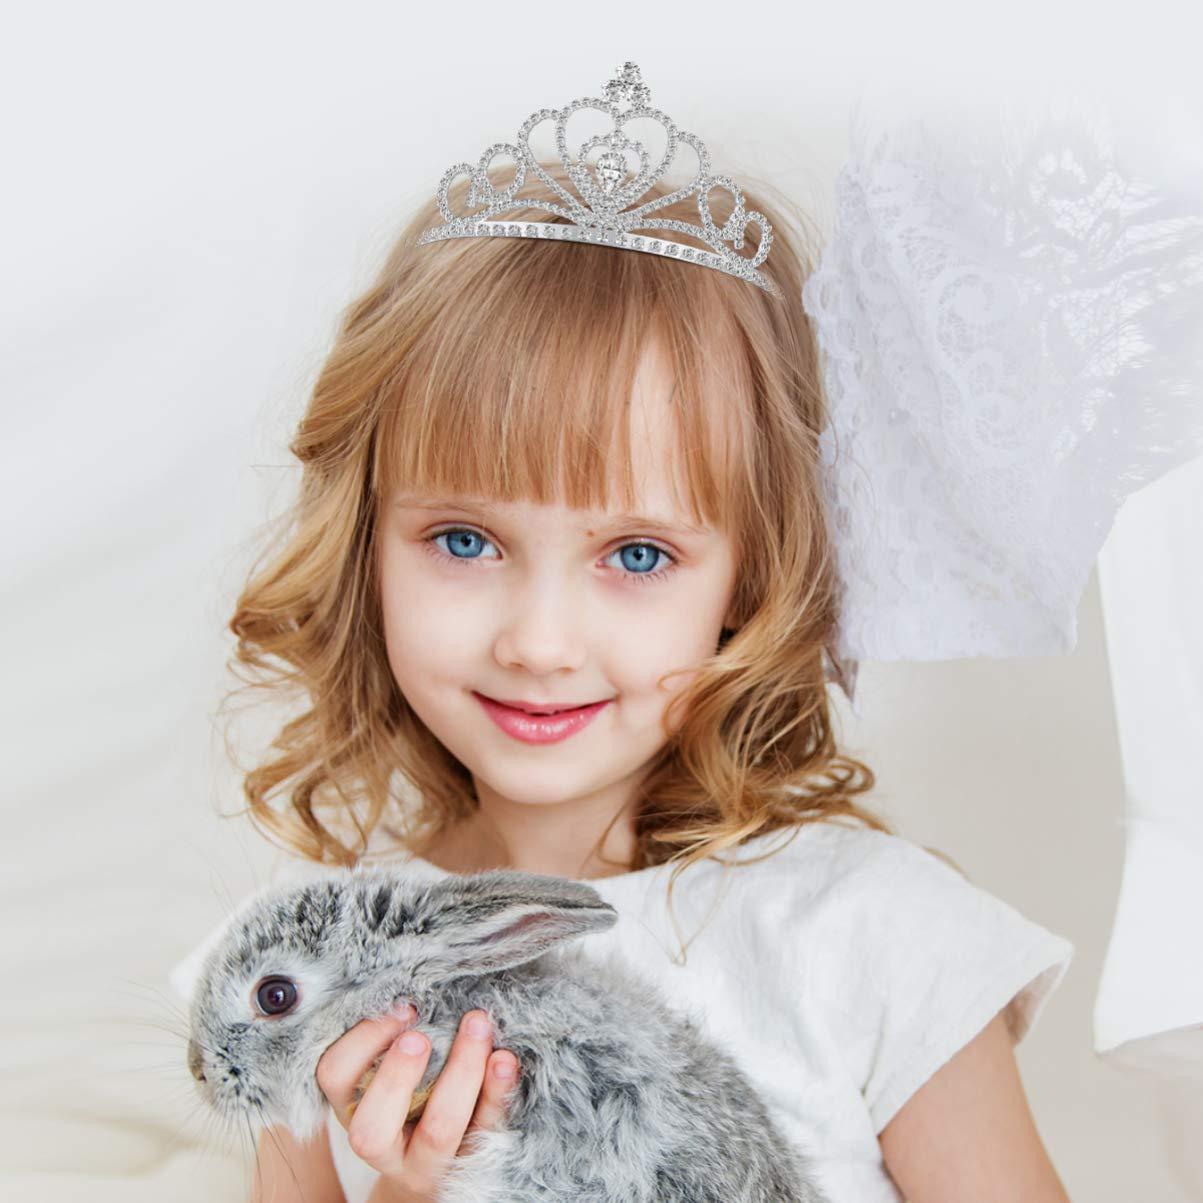 Crystal Rhinestones Tiara, Tiara Crown Wedding Bridal Tiara Headband Princess Crown with Comb 2 Pack